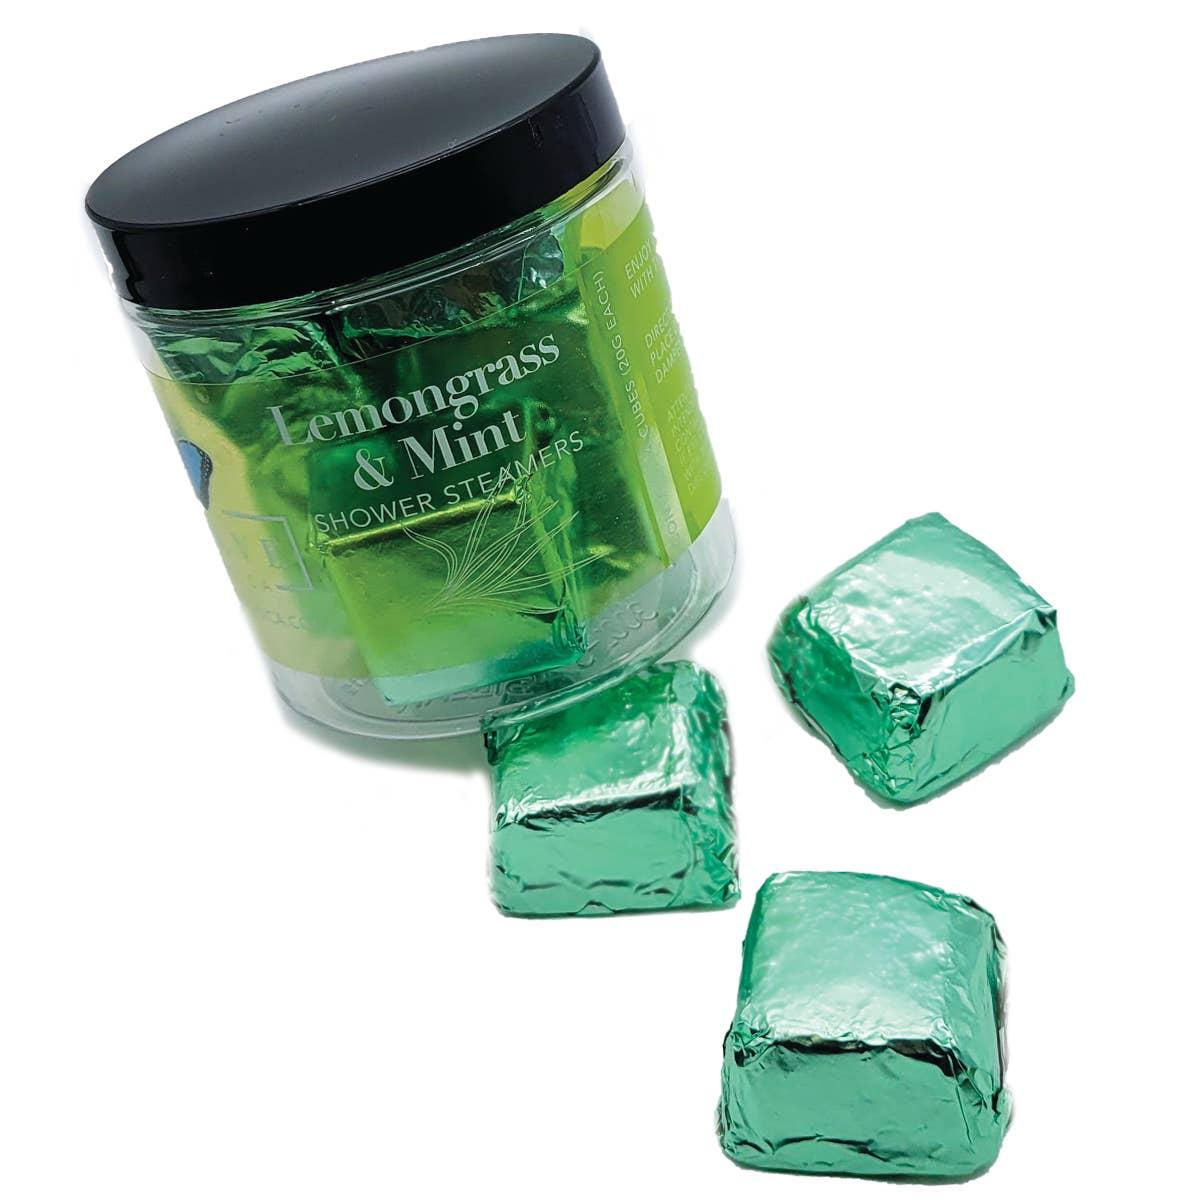 Evolve - Shower Steamers - Lemongrass Mint (6 per jar) | Trada Marketplace